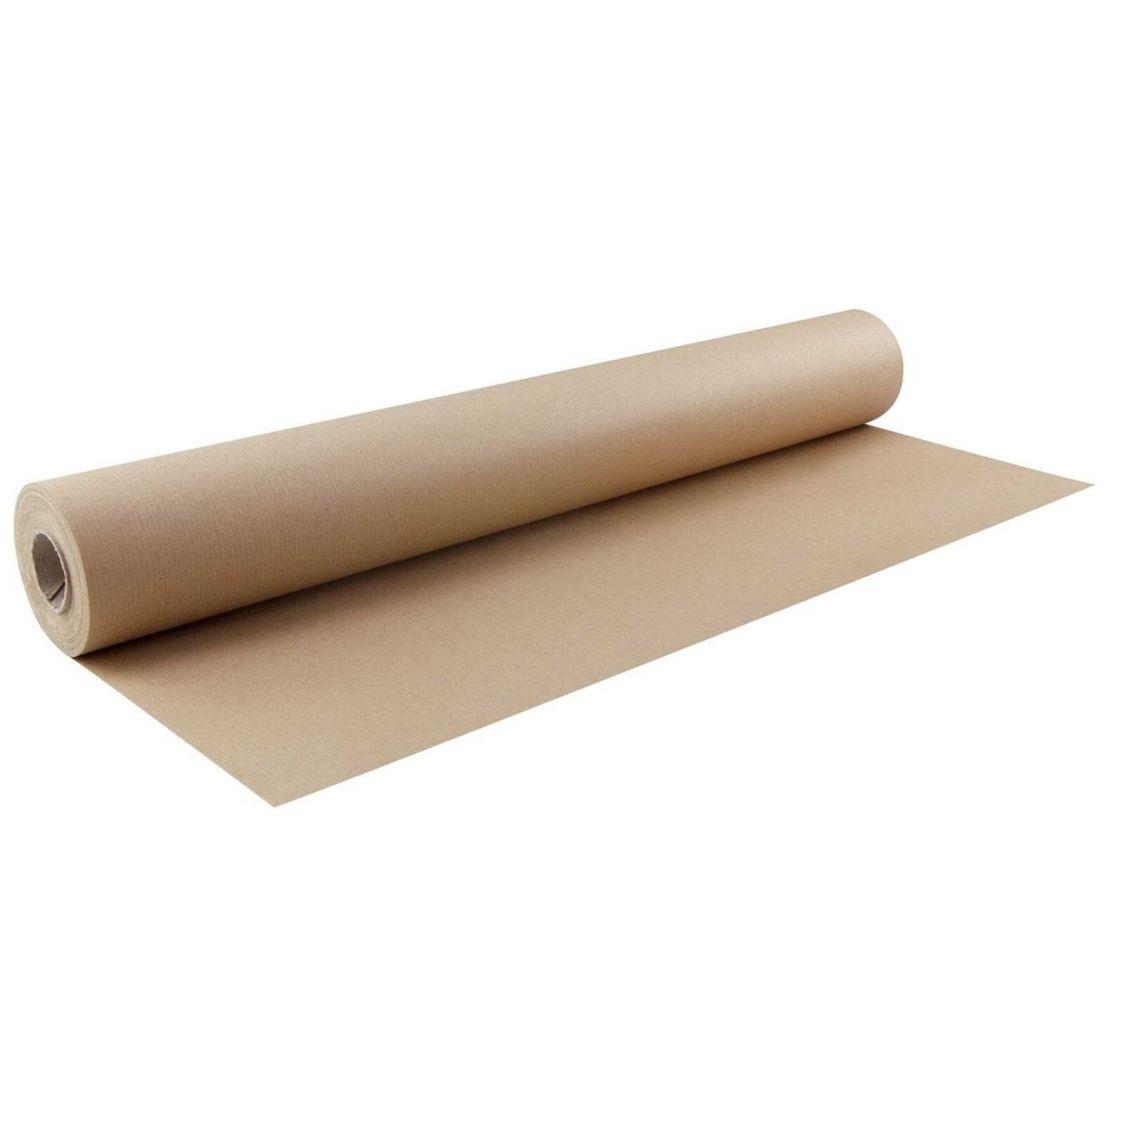 Packpapierrolle Einpackpapier Geschenkpapier, 75 cm x 25 m, braun